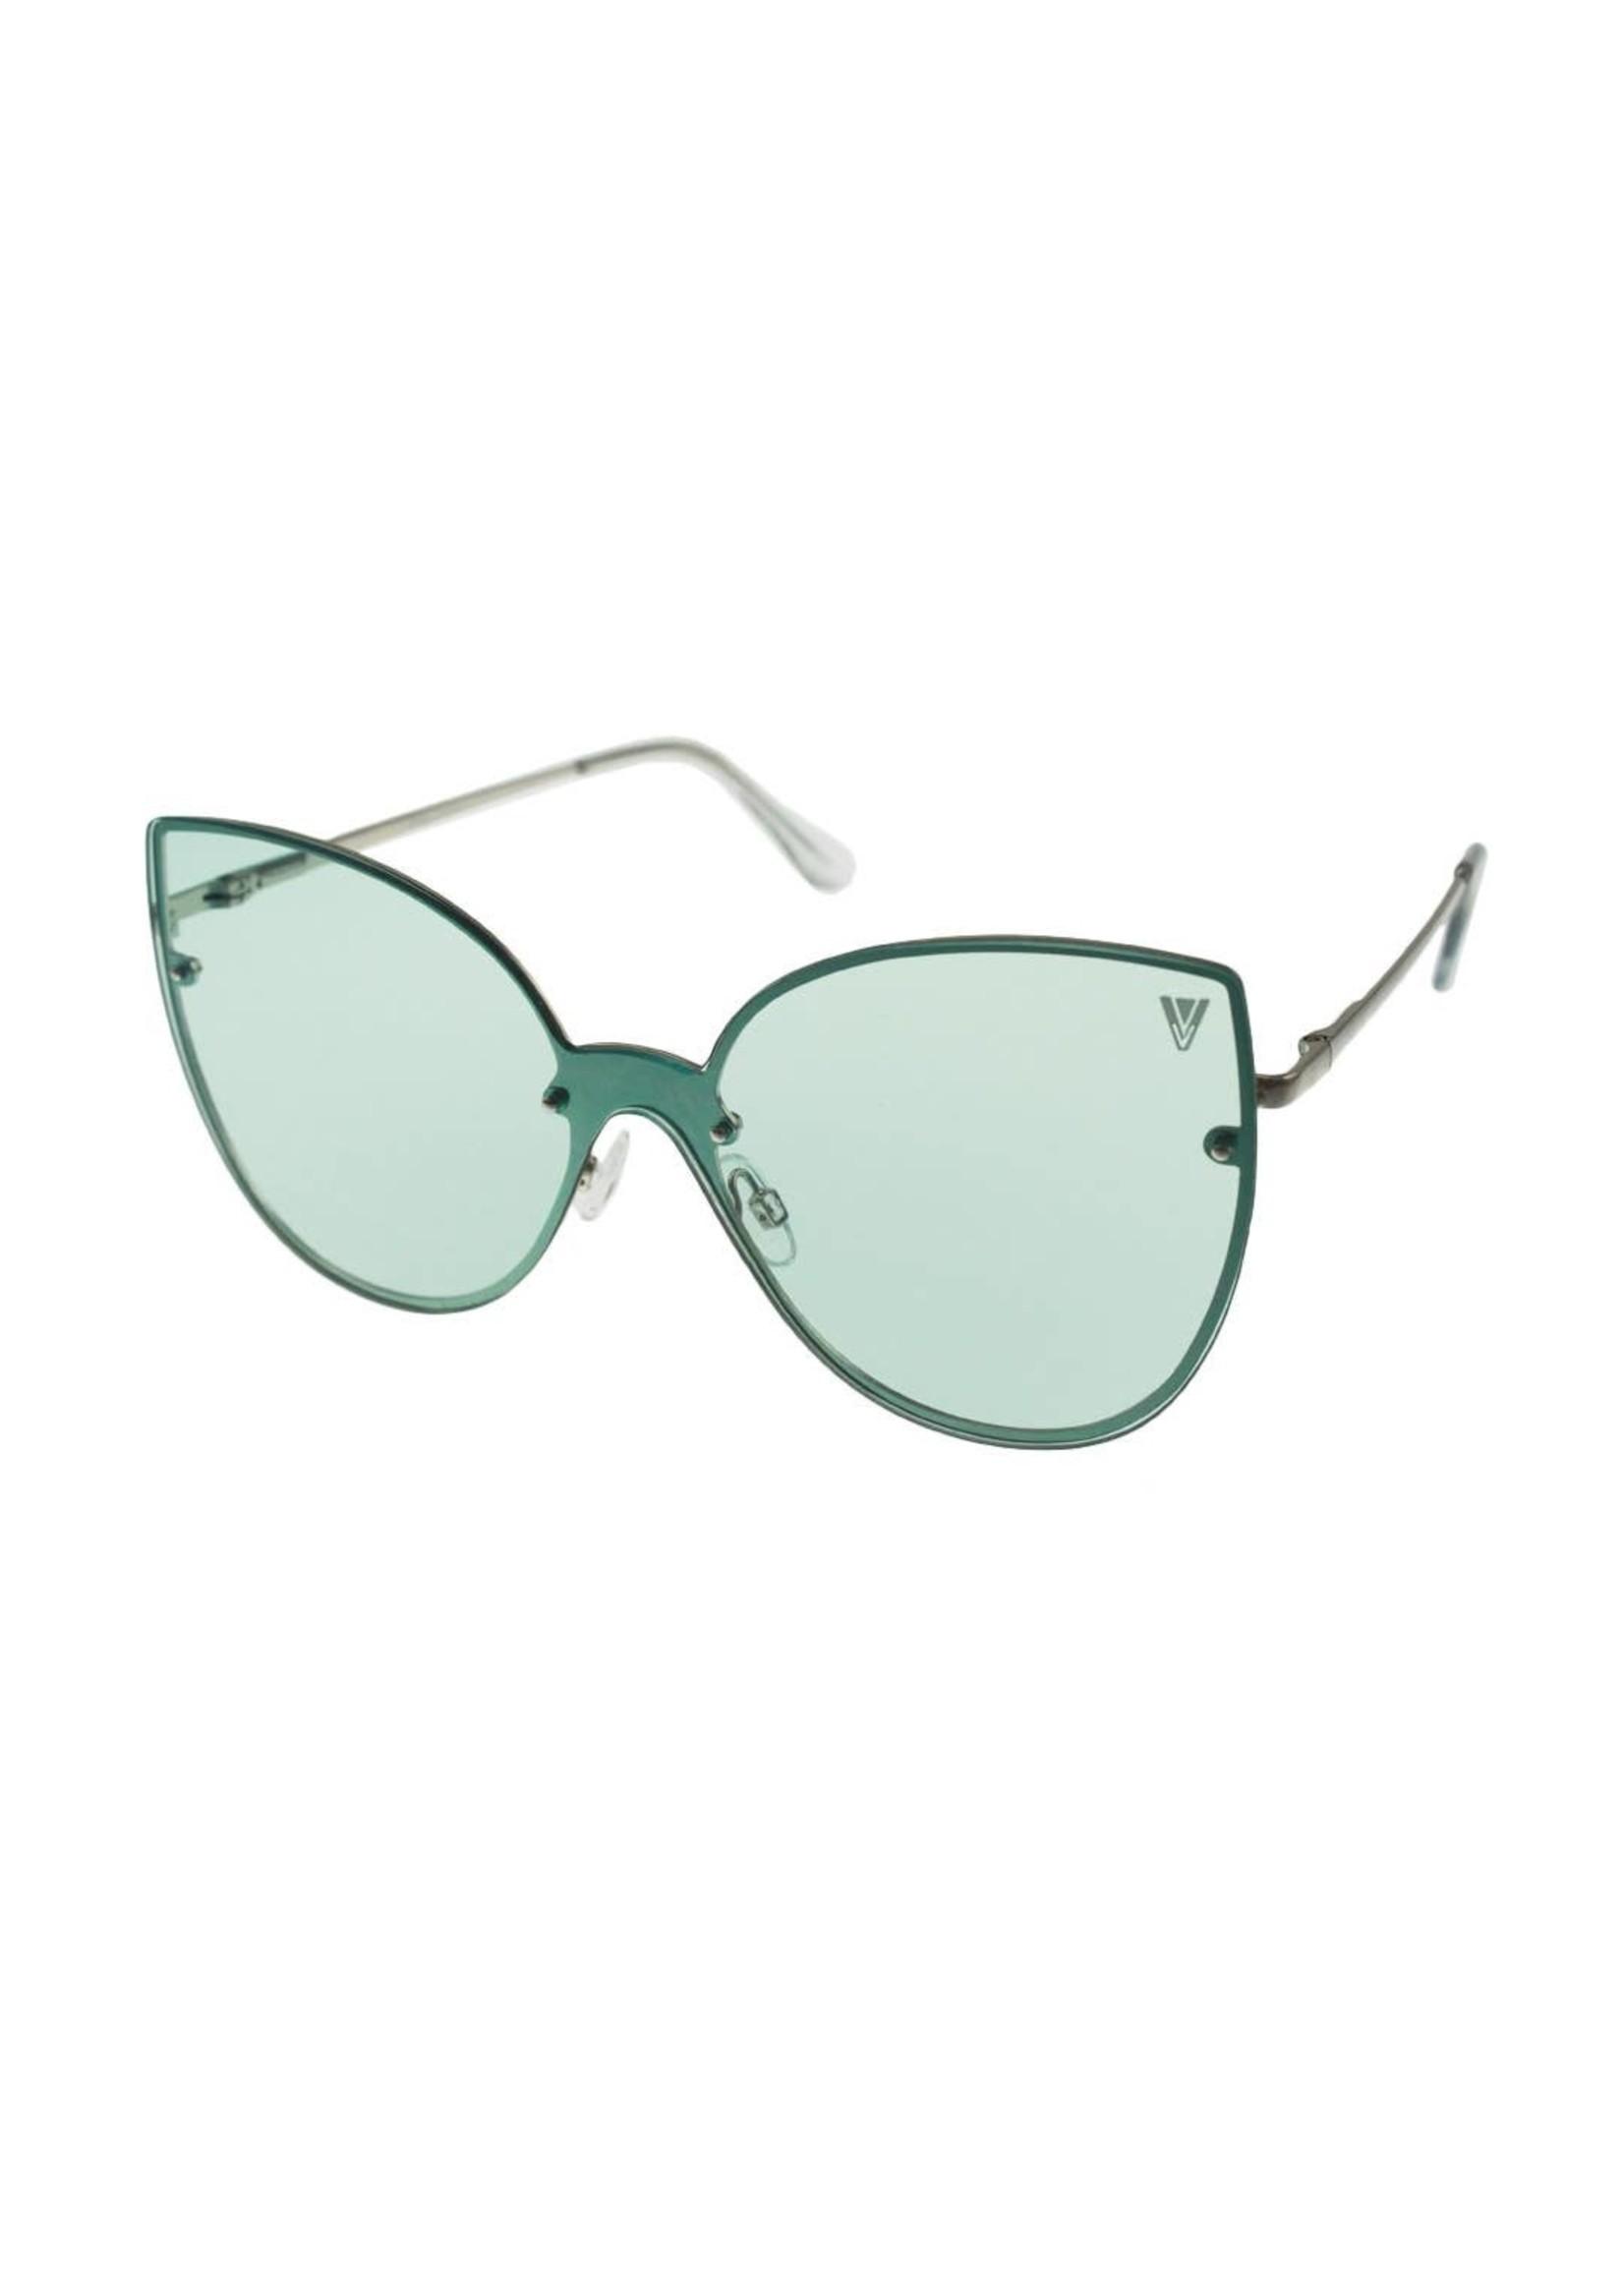 Kitty Womens Sunglasses Green